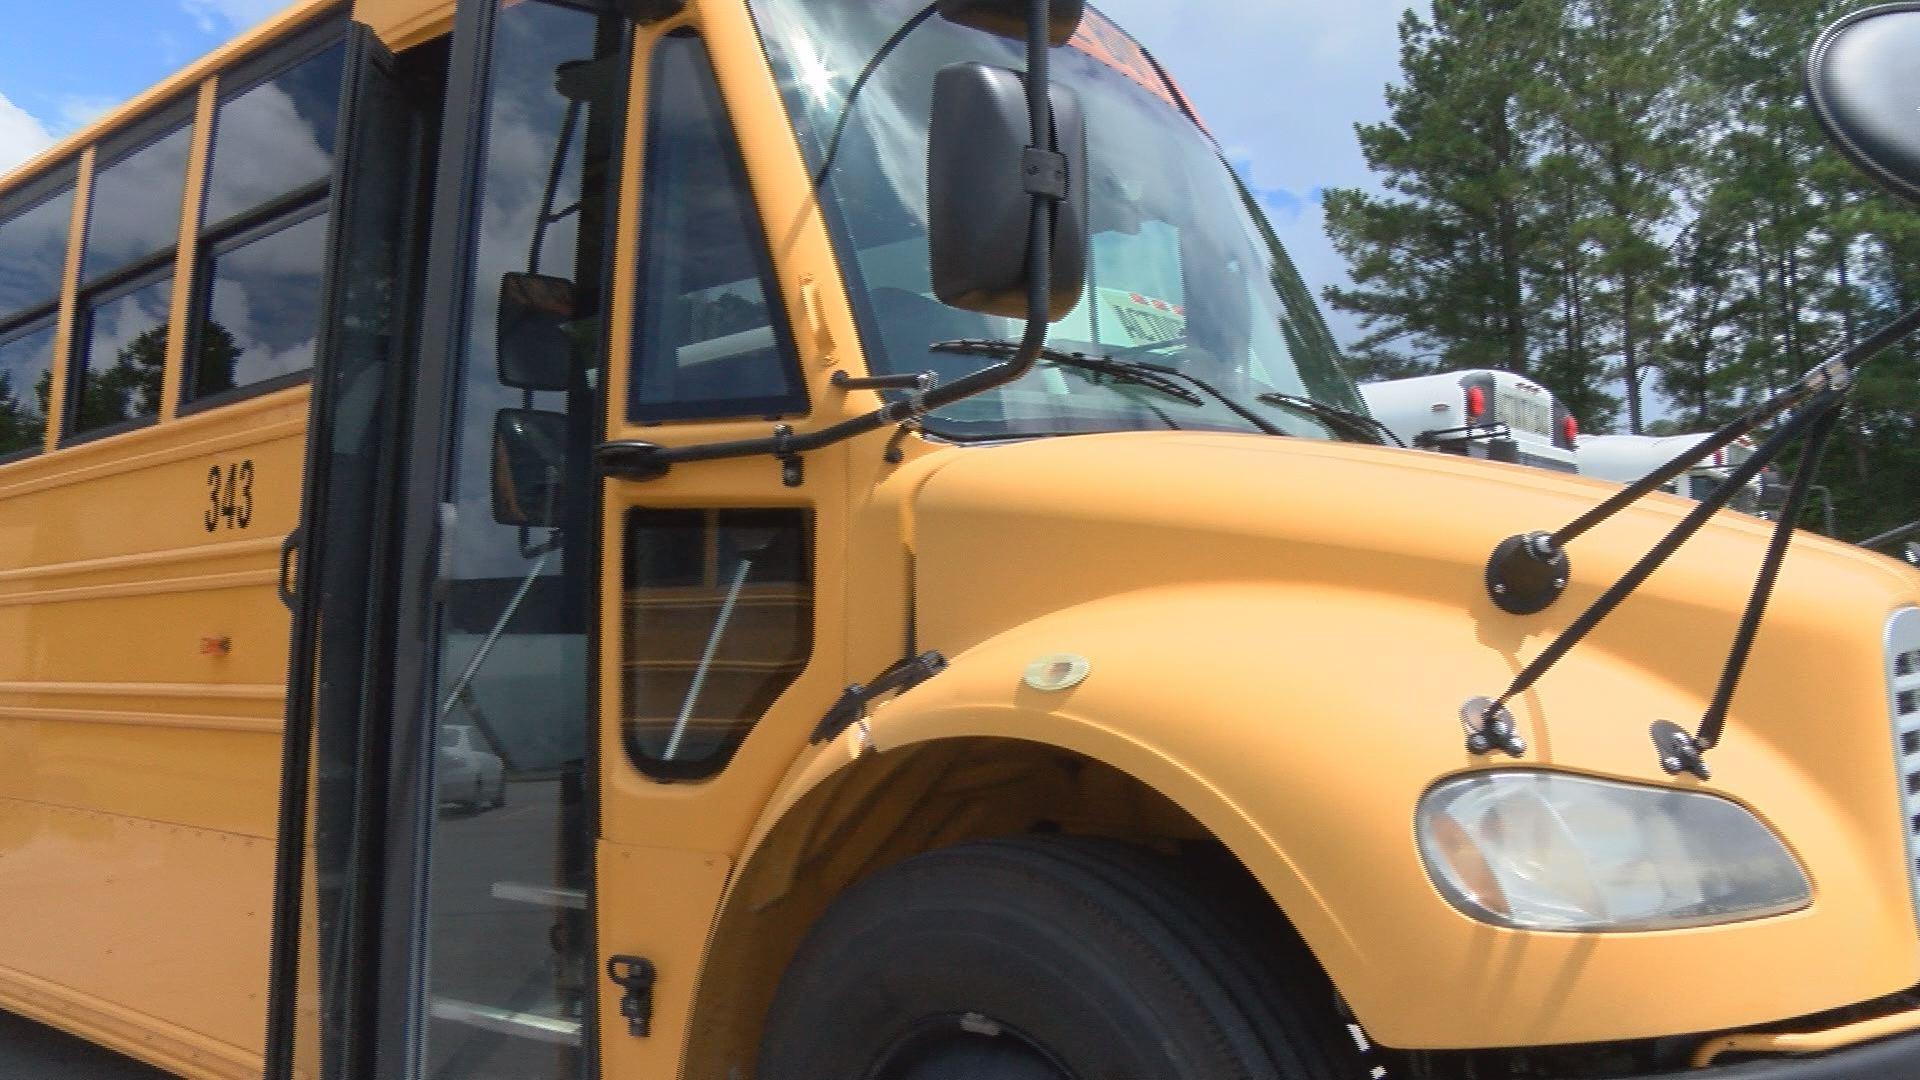 pitt county bus delays_264233